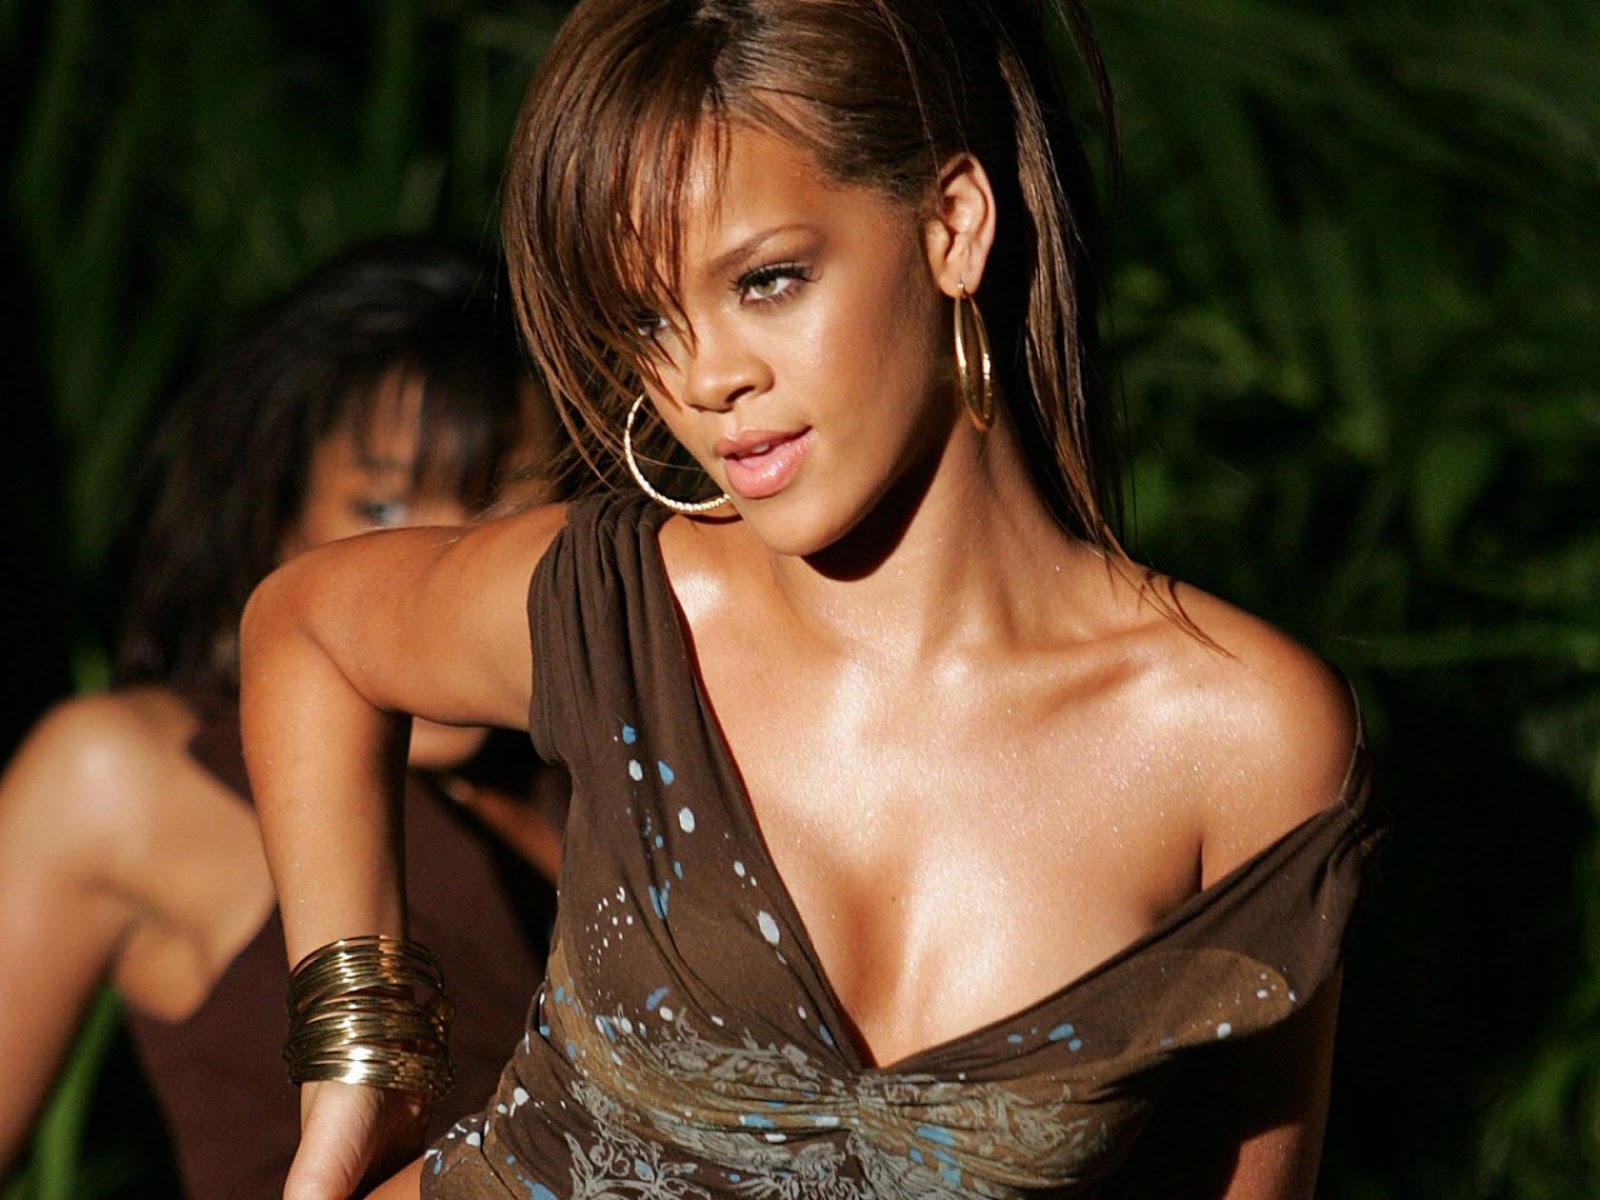 Rihanna: Rihanna Hollywood Star Latest Hd Wallpapers 2013